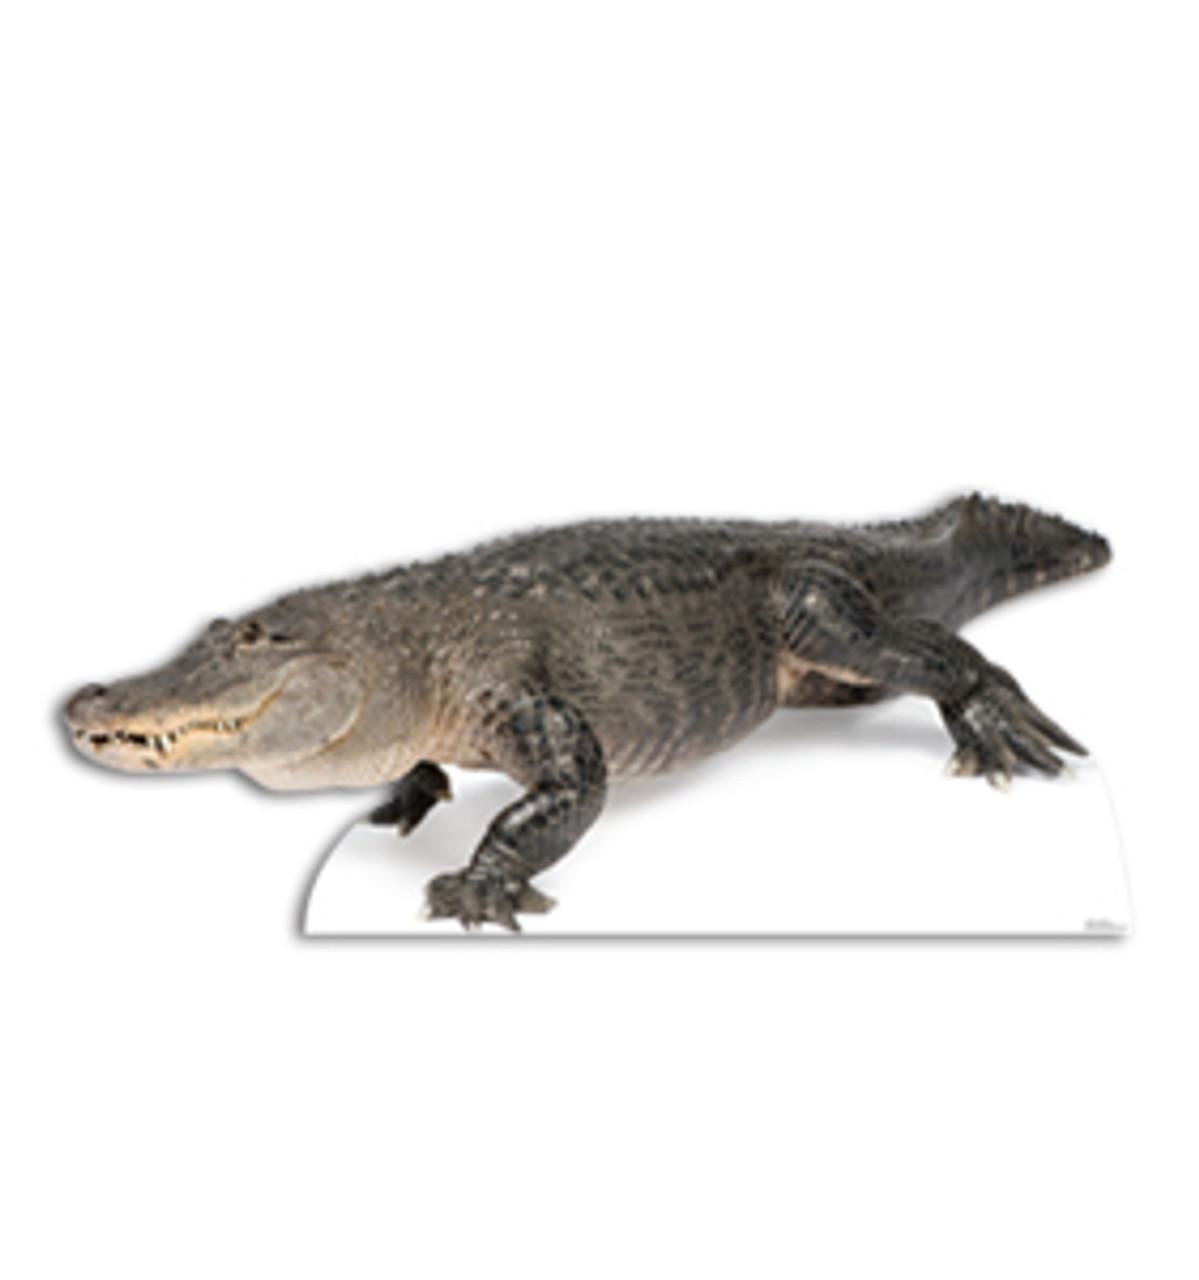 Life-size American Alligator Cardboard Standup | Cardboard Cutout 2